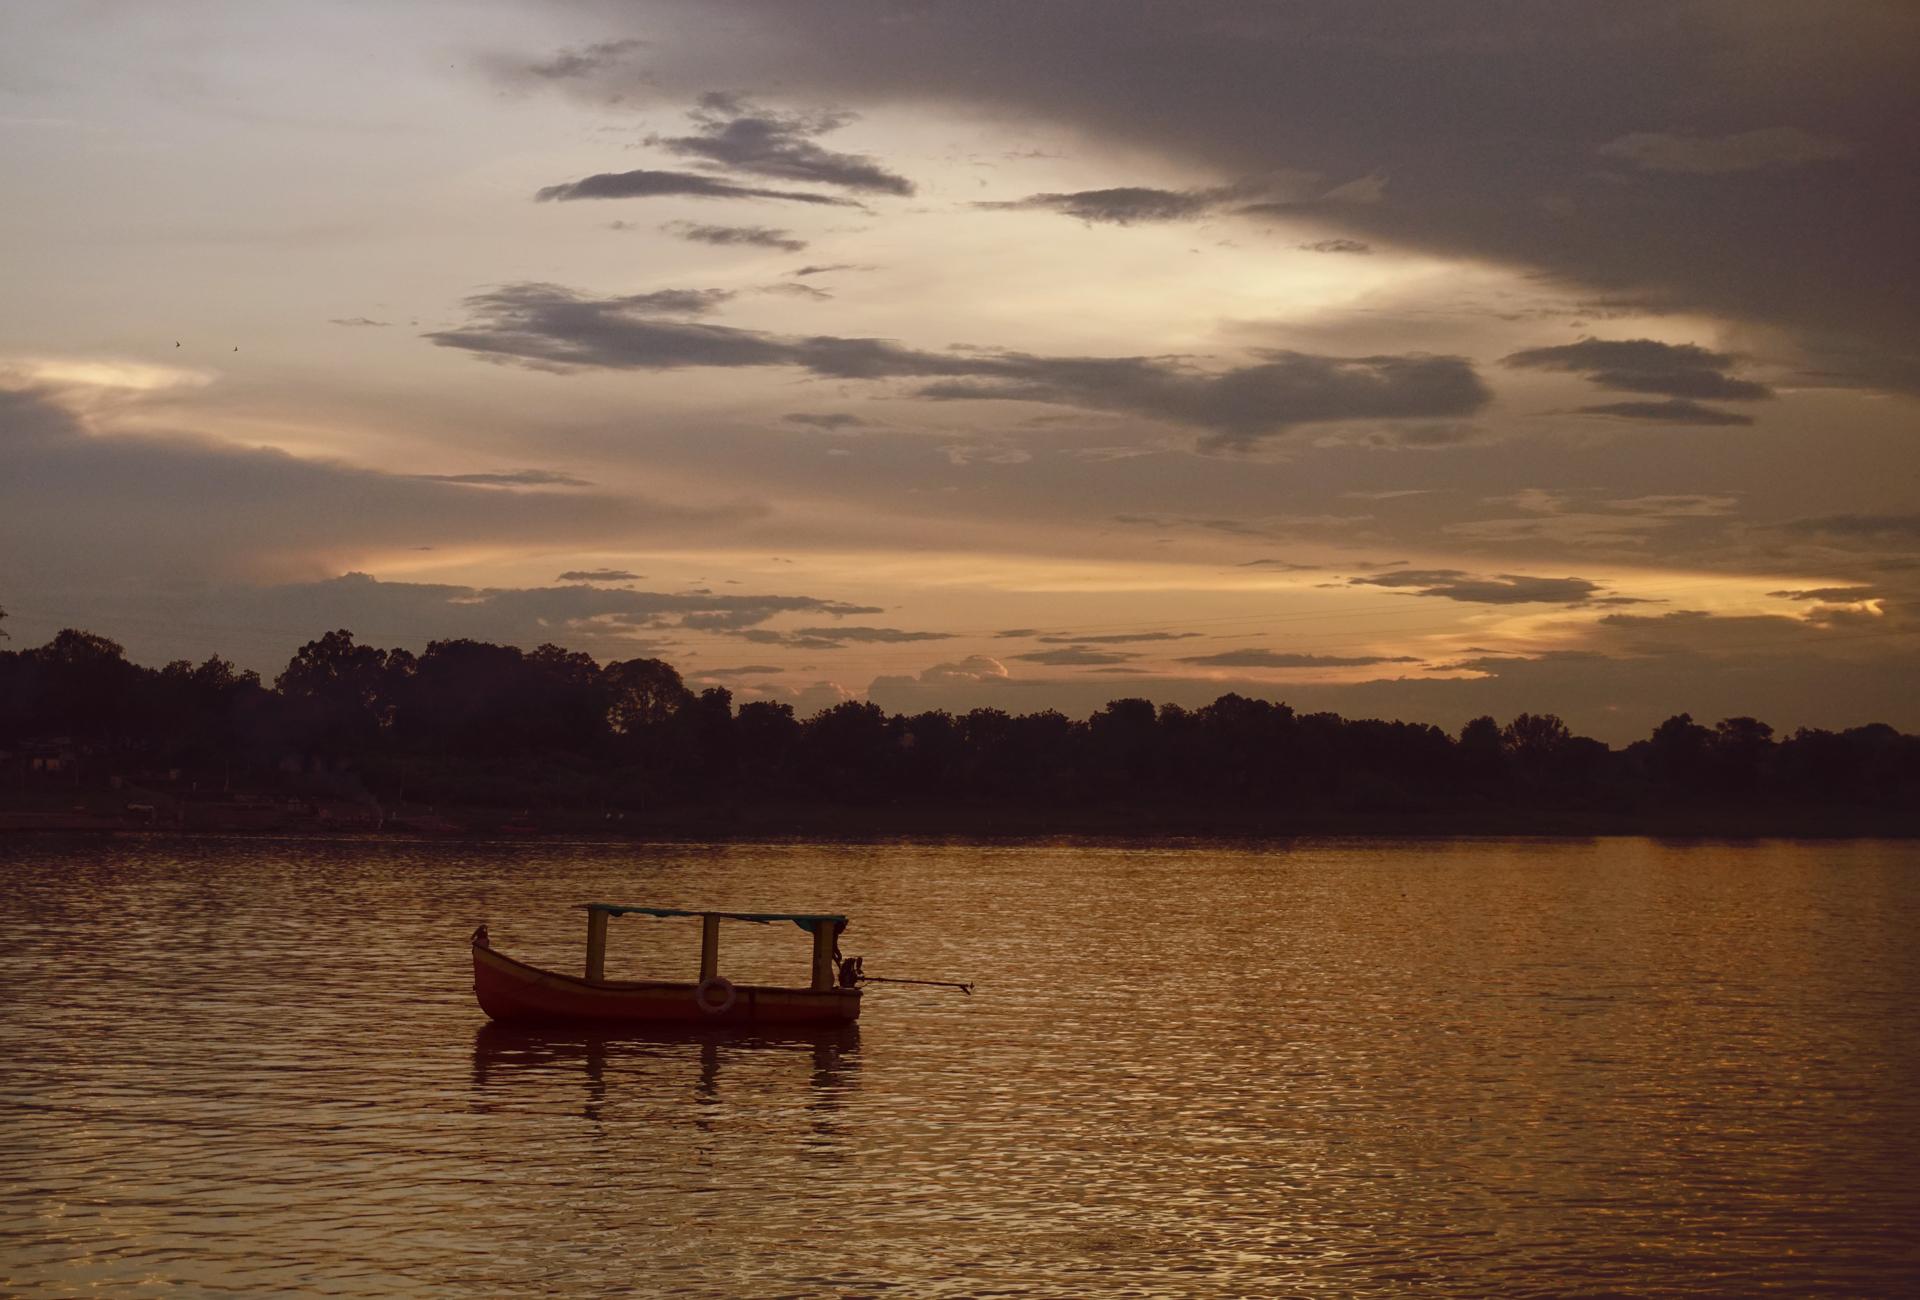 Rainy season with combination of floating clouds and sunrise, sunset saffron hue has enchanting moods.